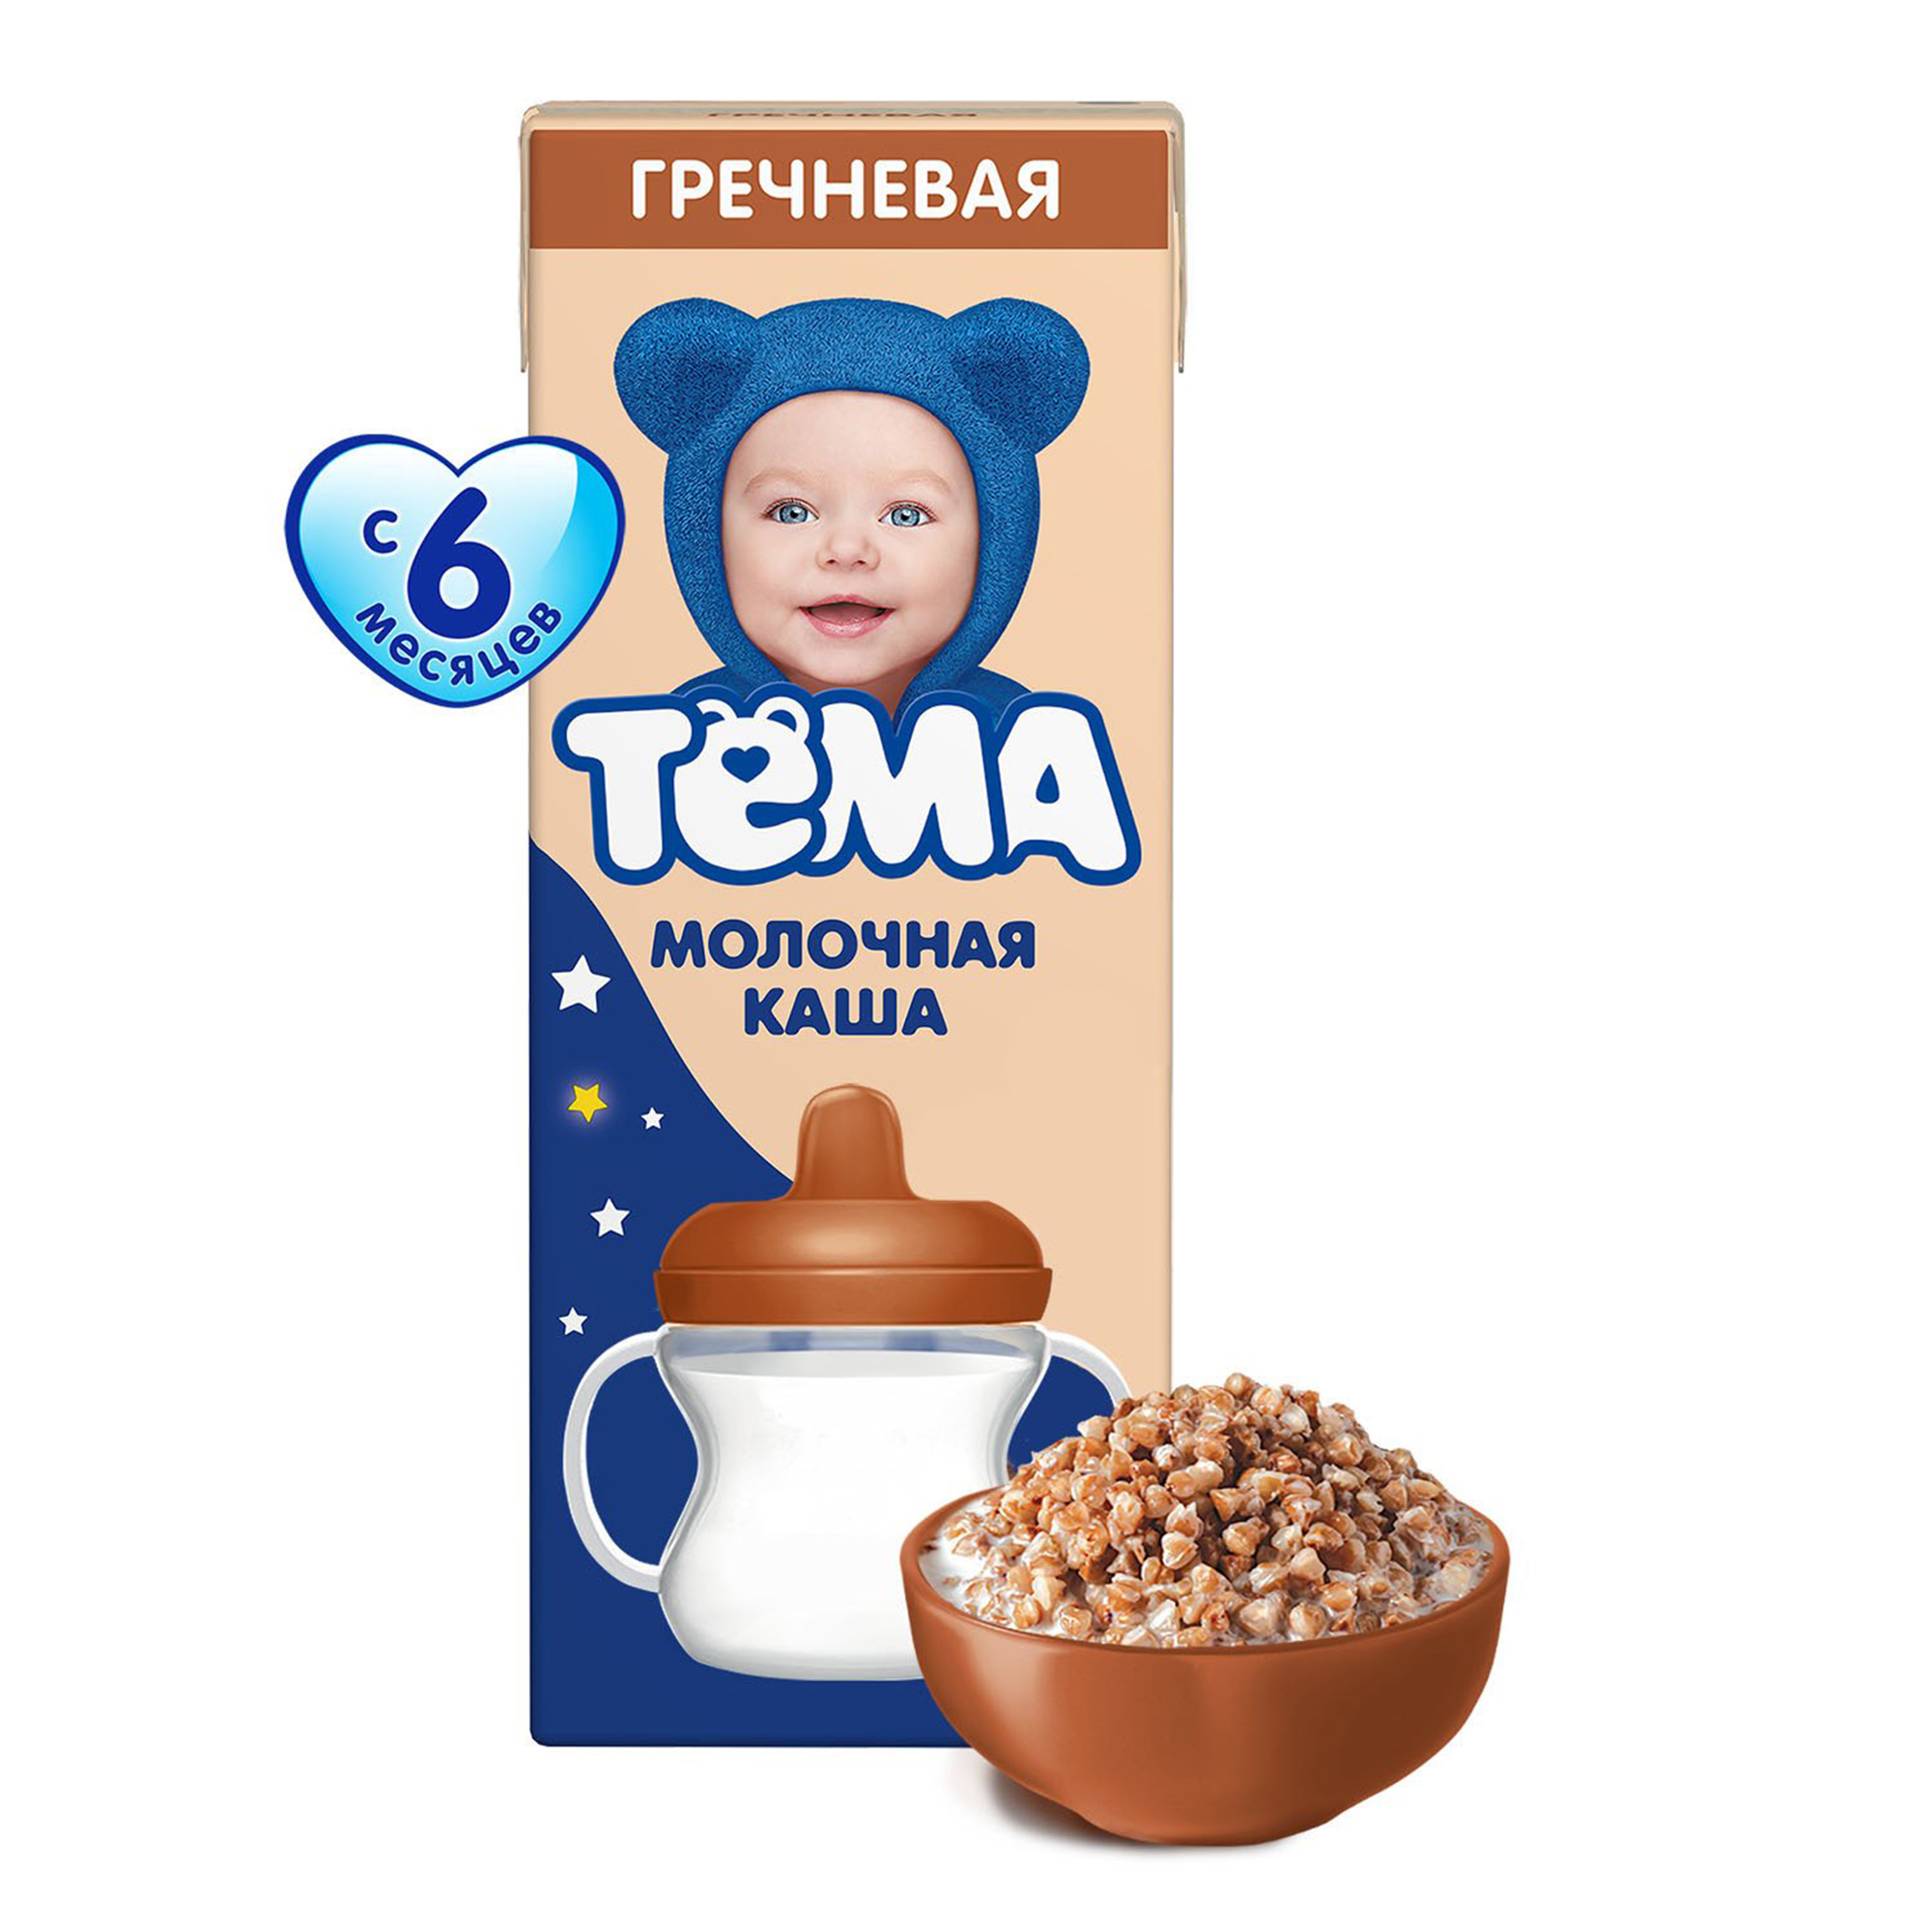 Фото - Каша Тёма молочная гречневая с пребиотиком 2,2% с 6-ти месяцев 206 г каша nutrilon молочная гречневая с 6 месяцев 200 г